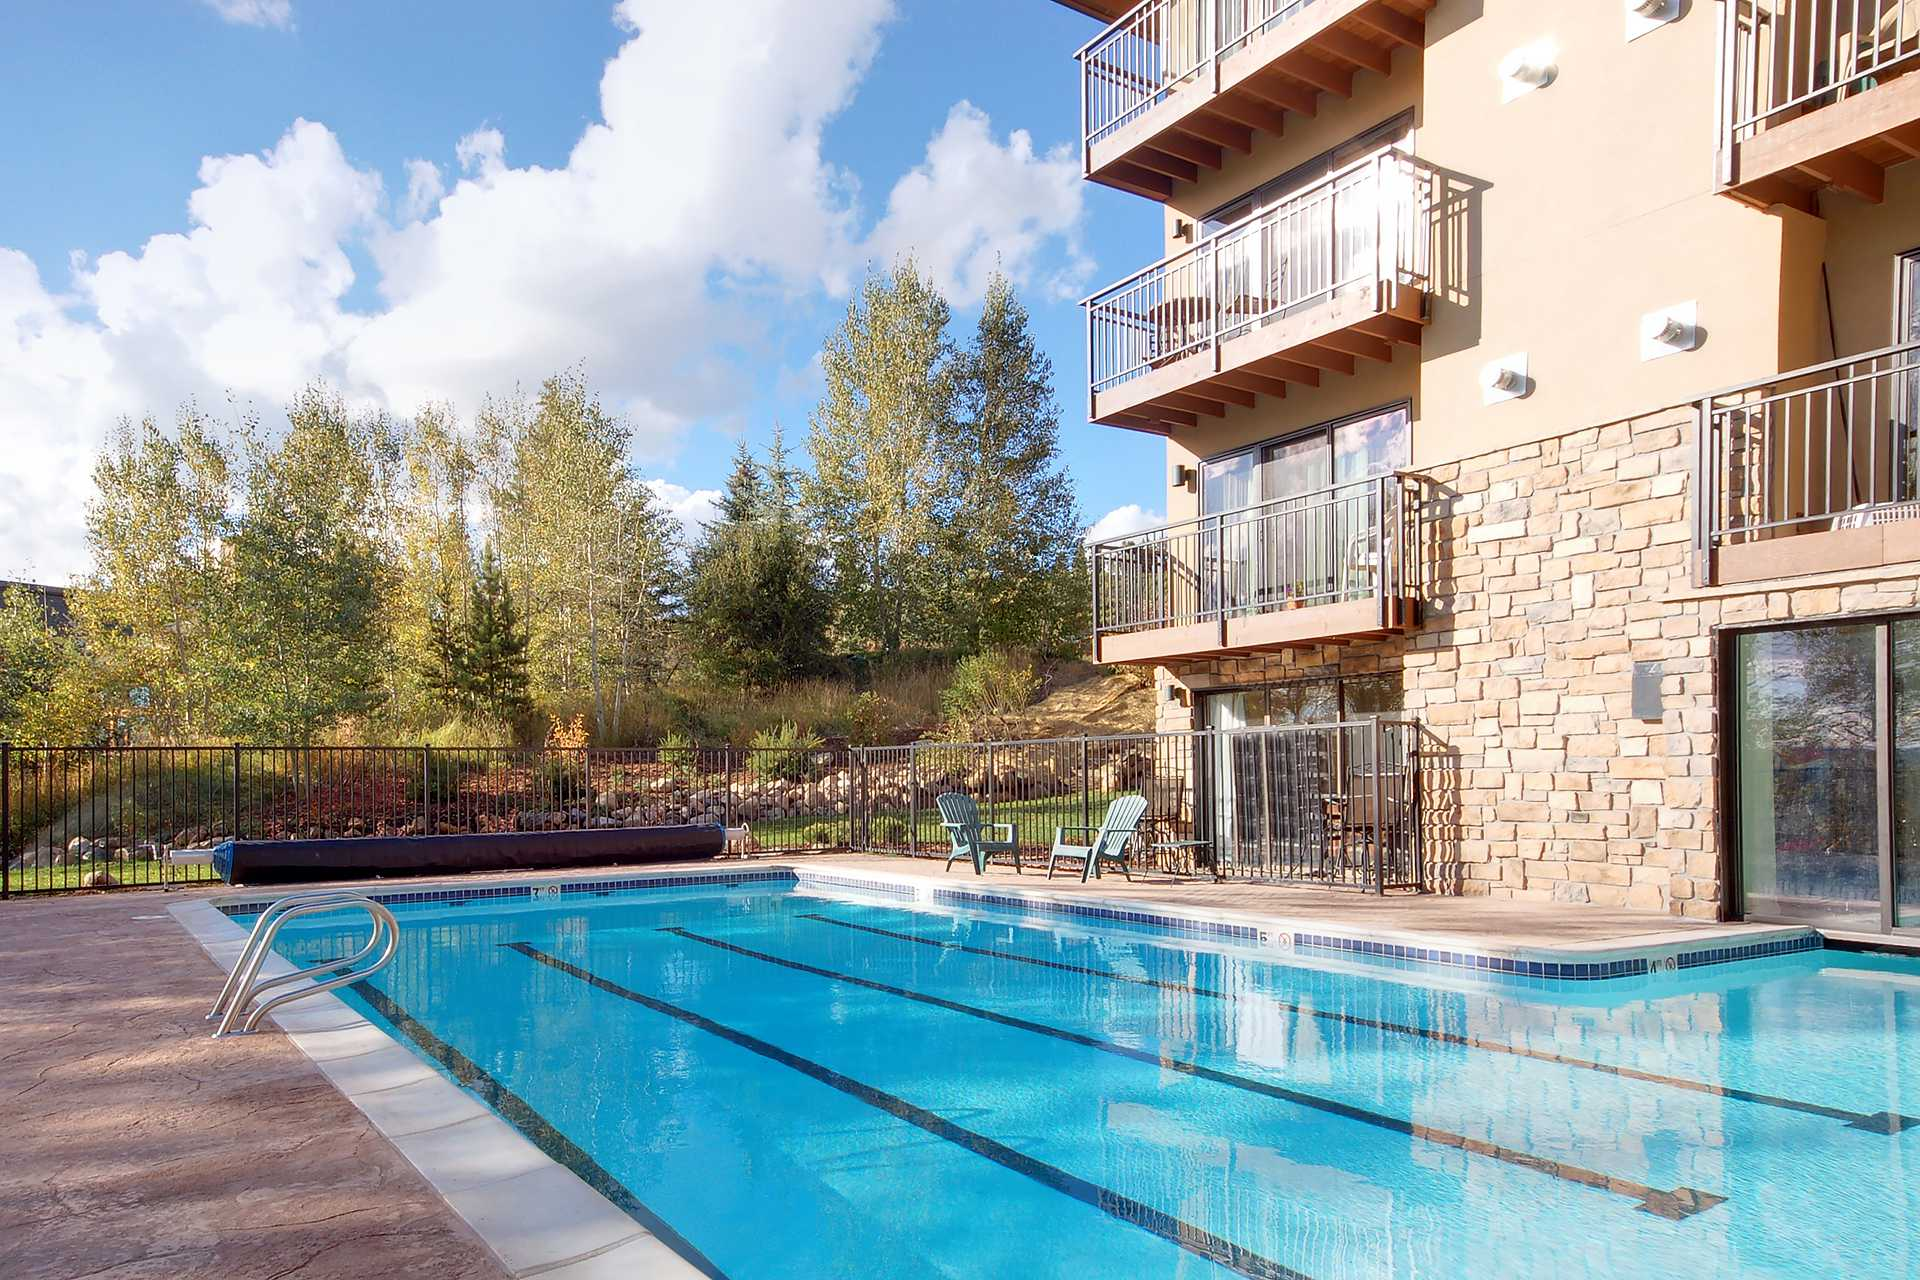 SL205 - Scandinavian Lodge and Condominiums